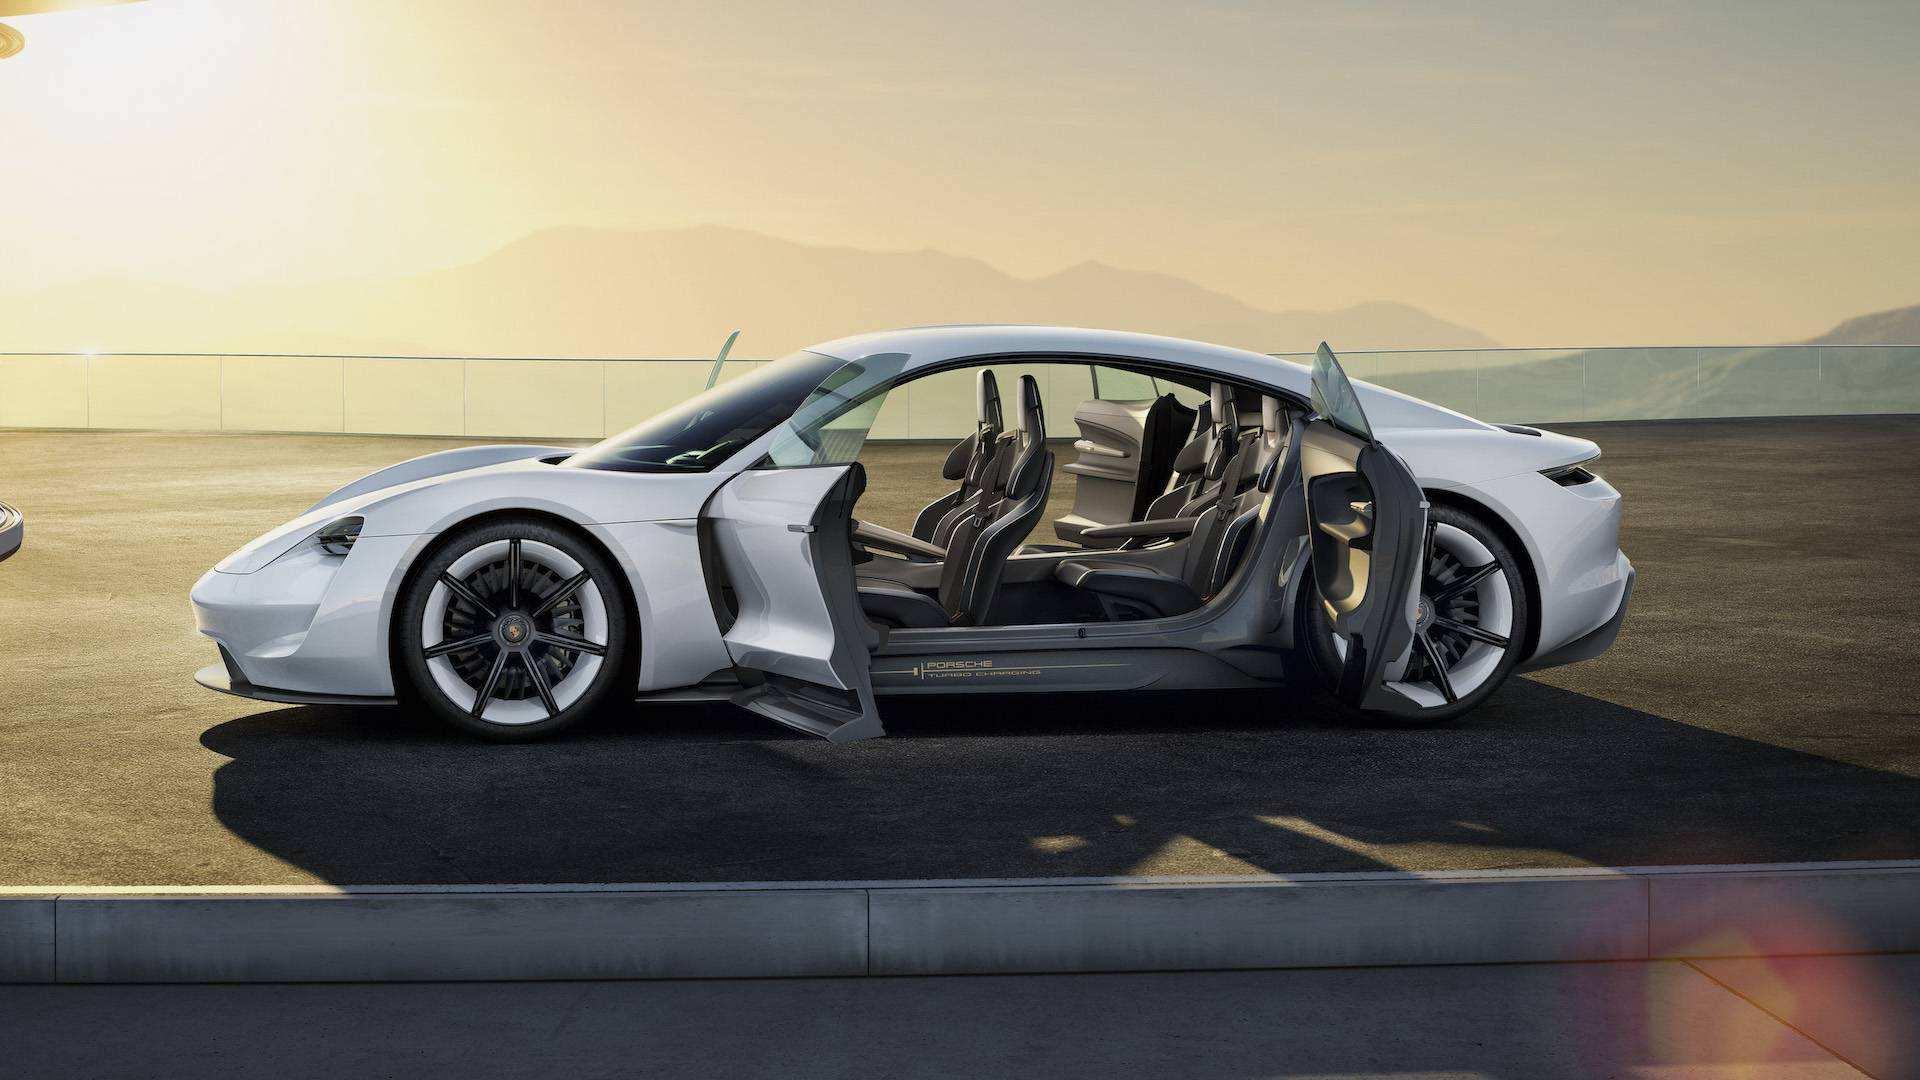 44 Concept of 2020 Porsche Taycan Images with 2020 Porsche Taycan